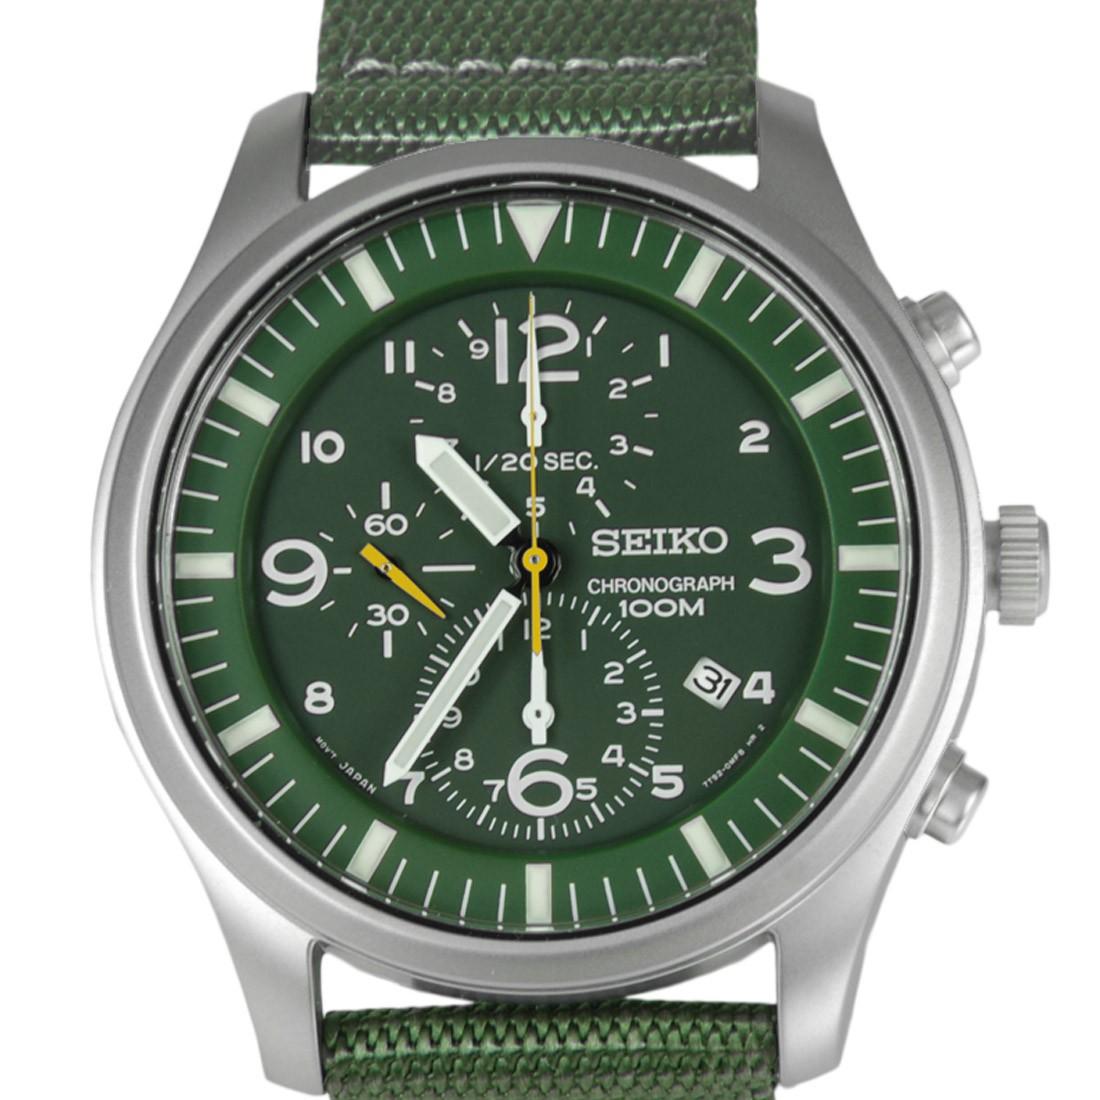 Seiko Military Chronograph SNDA27P1